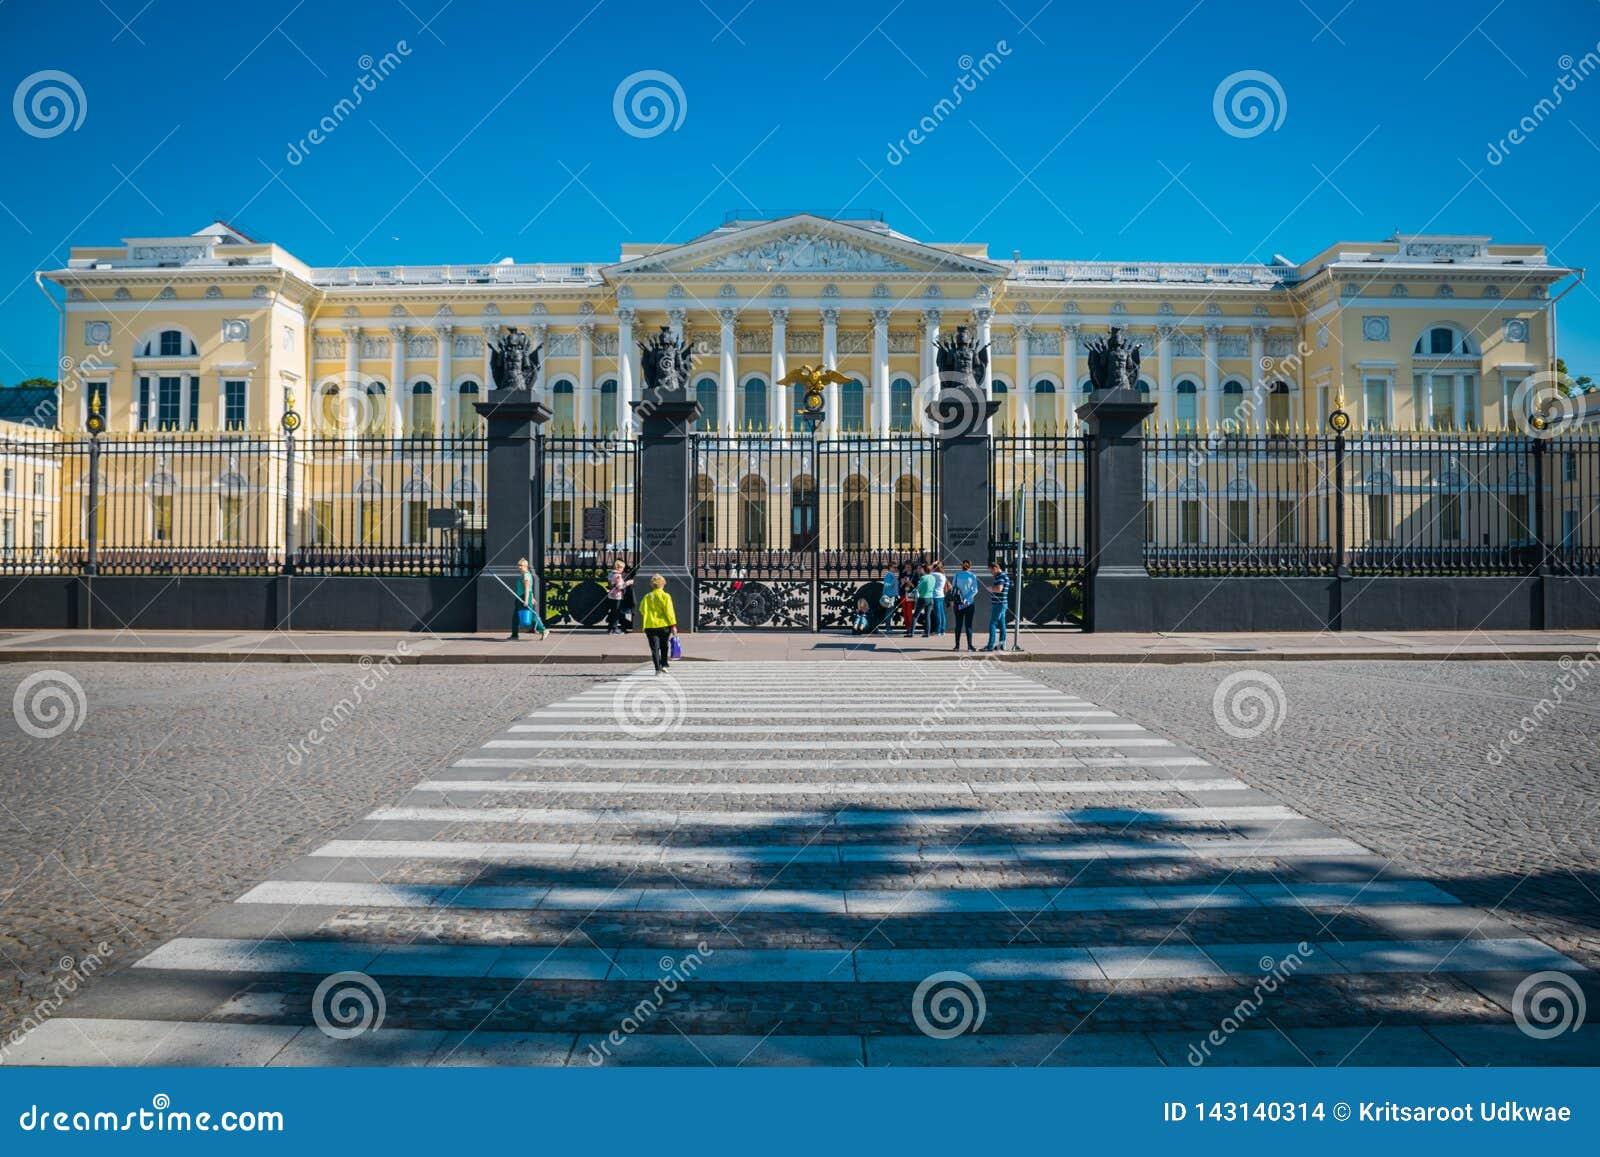 Museo ruso en St Petersburg, Rusia